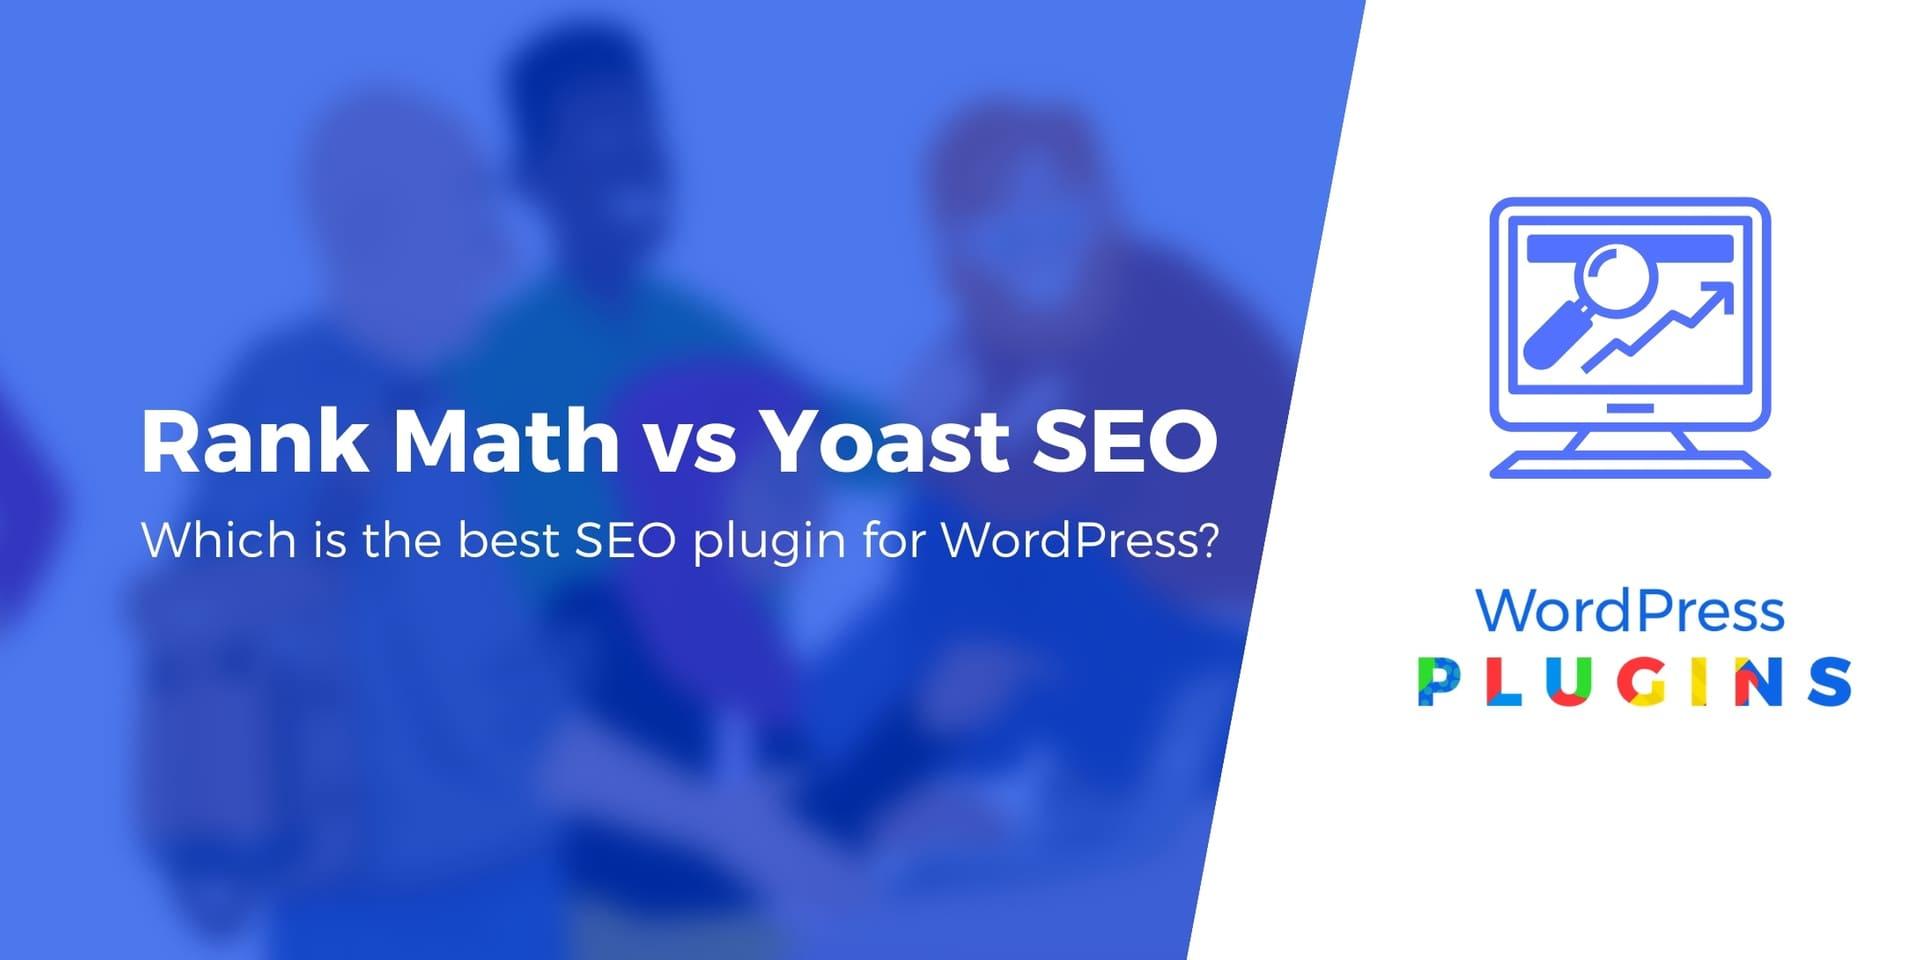 yoast-seo-vs-rank-math